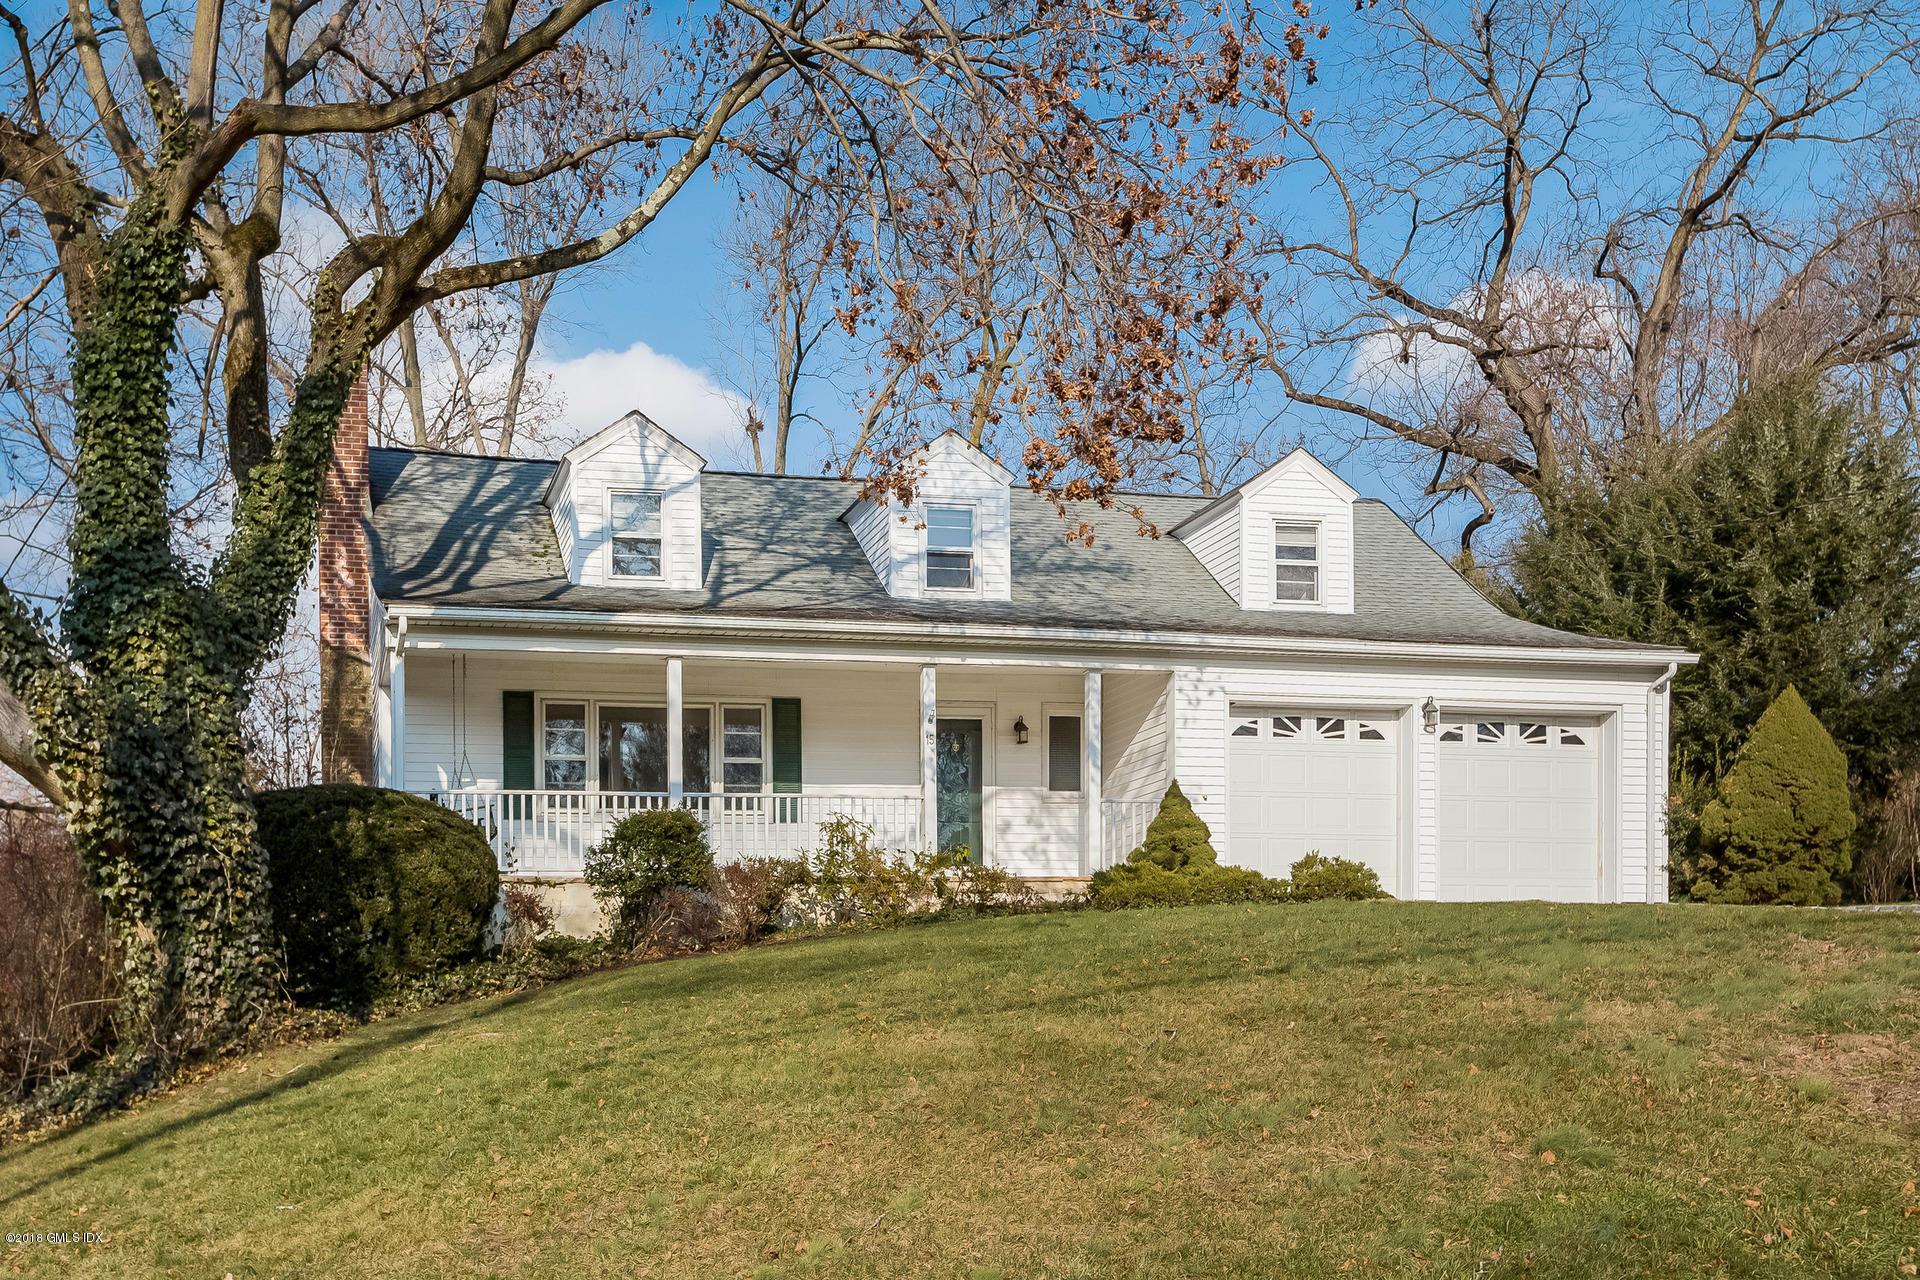 15 Bayside Terrace,Riverside,Connecticut 06878,4 Bedrooms Bedrooms,3 BathroomsBathrooms,Single family,Bayside,105096